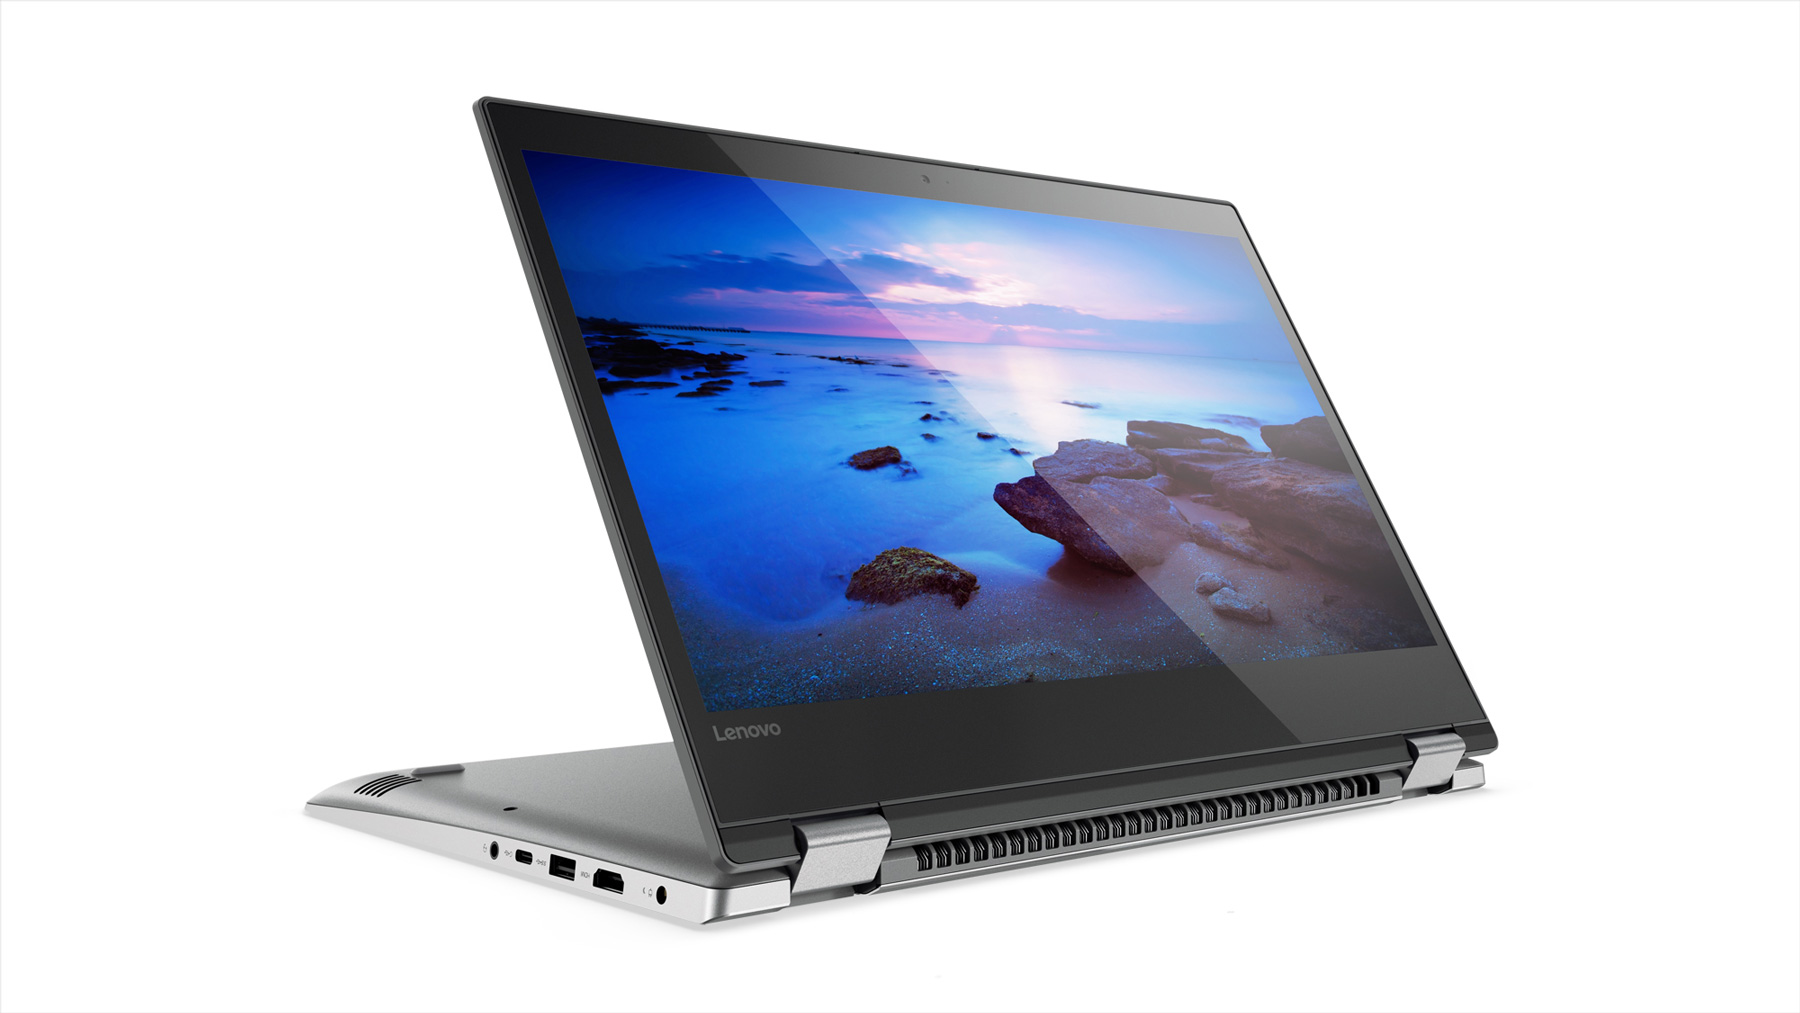 Фото  Ультрабук Lenovo Yoga 520 (81C800DHRA) Mineral Grey